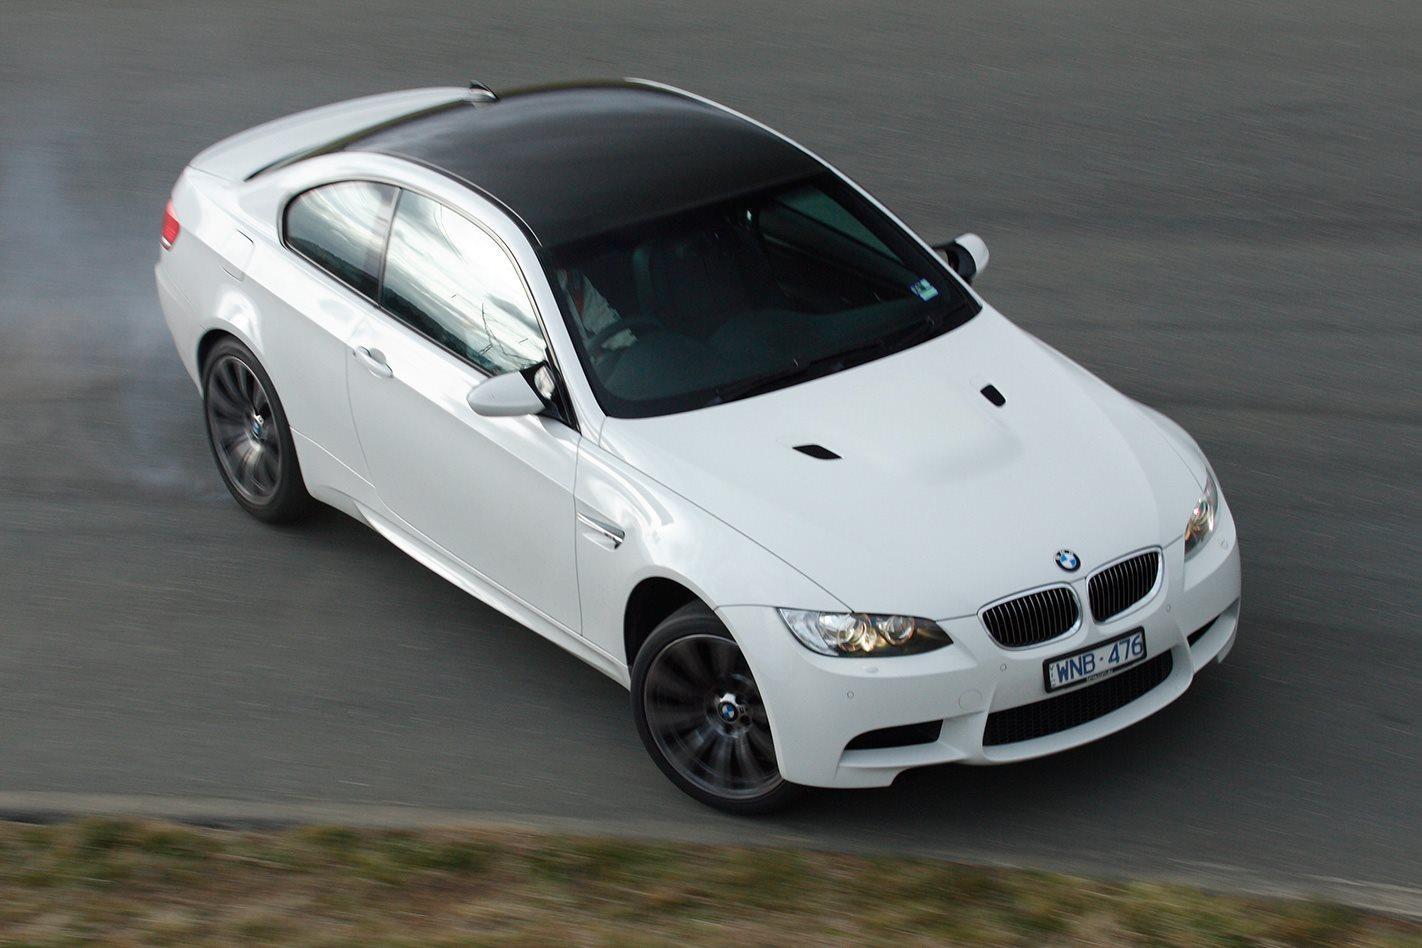 2008-BMW-M3-M-DCT-aerial.jpg